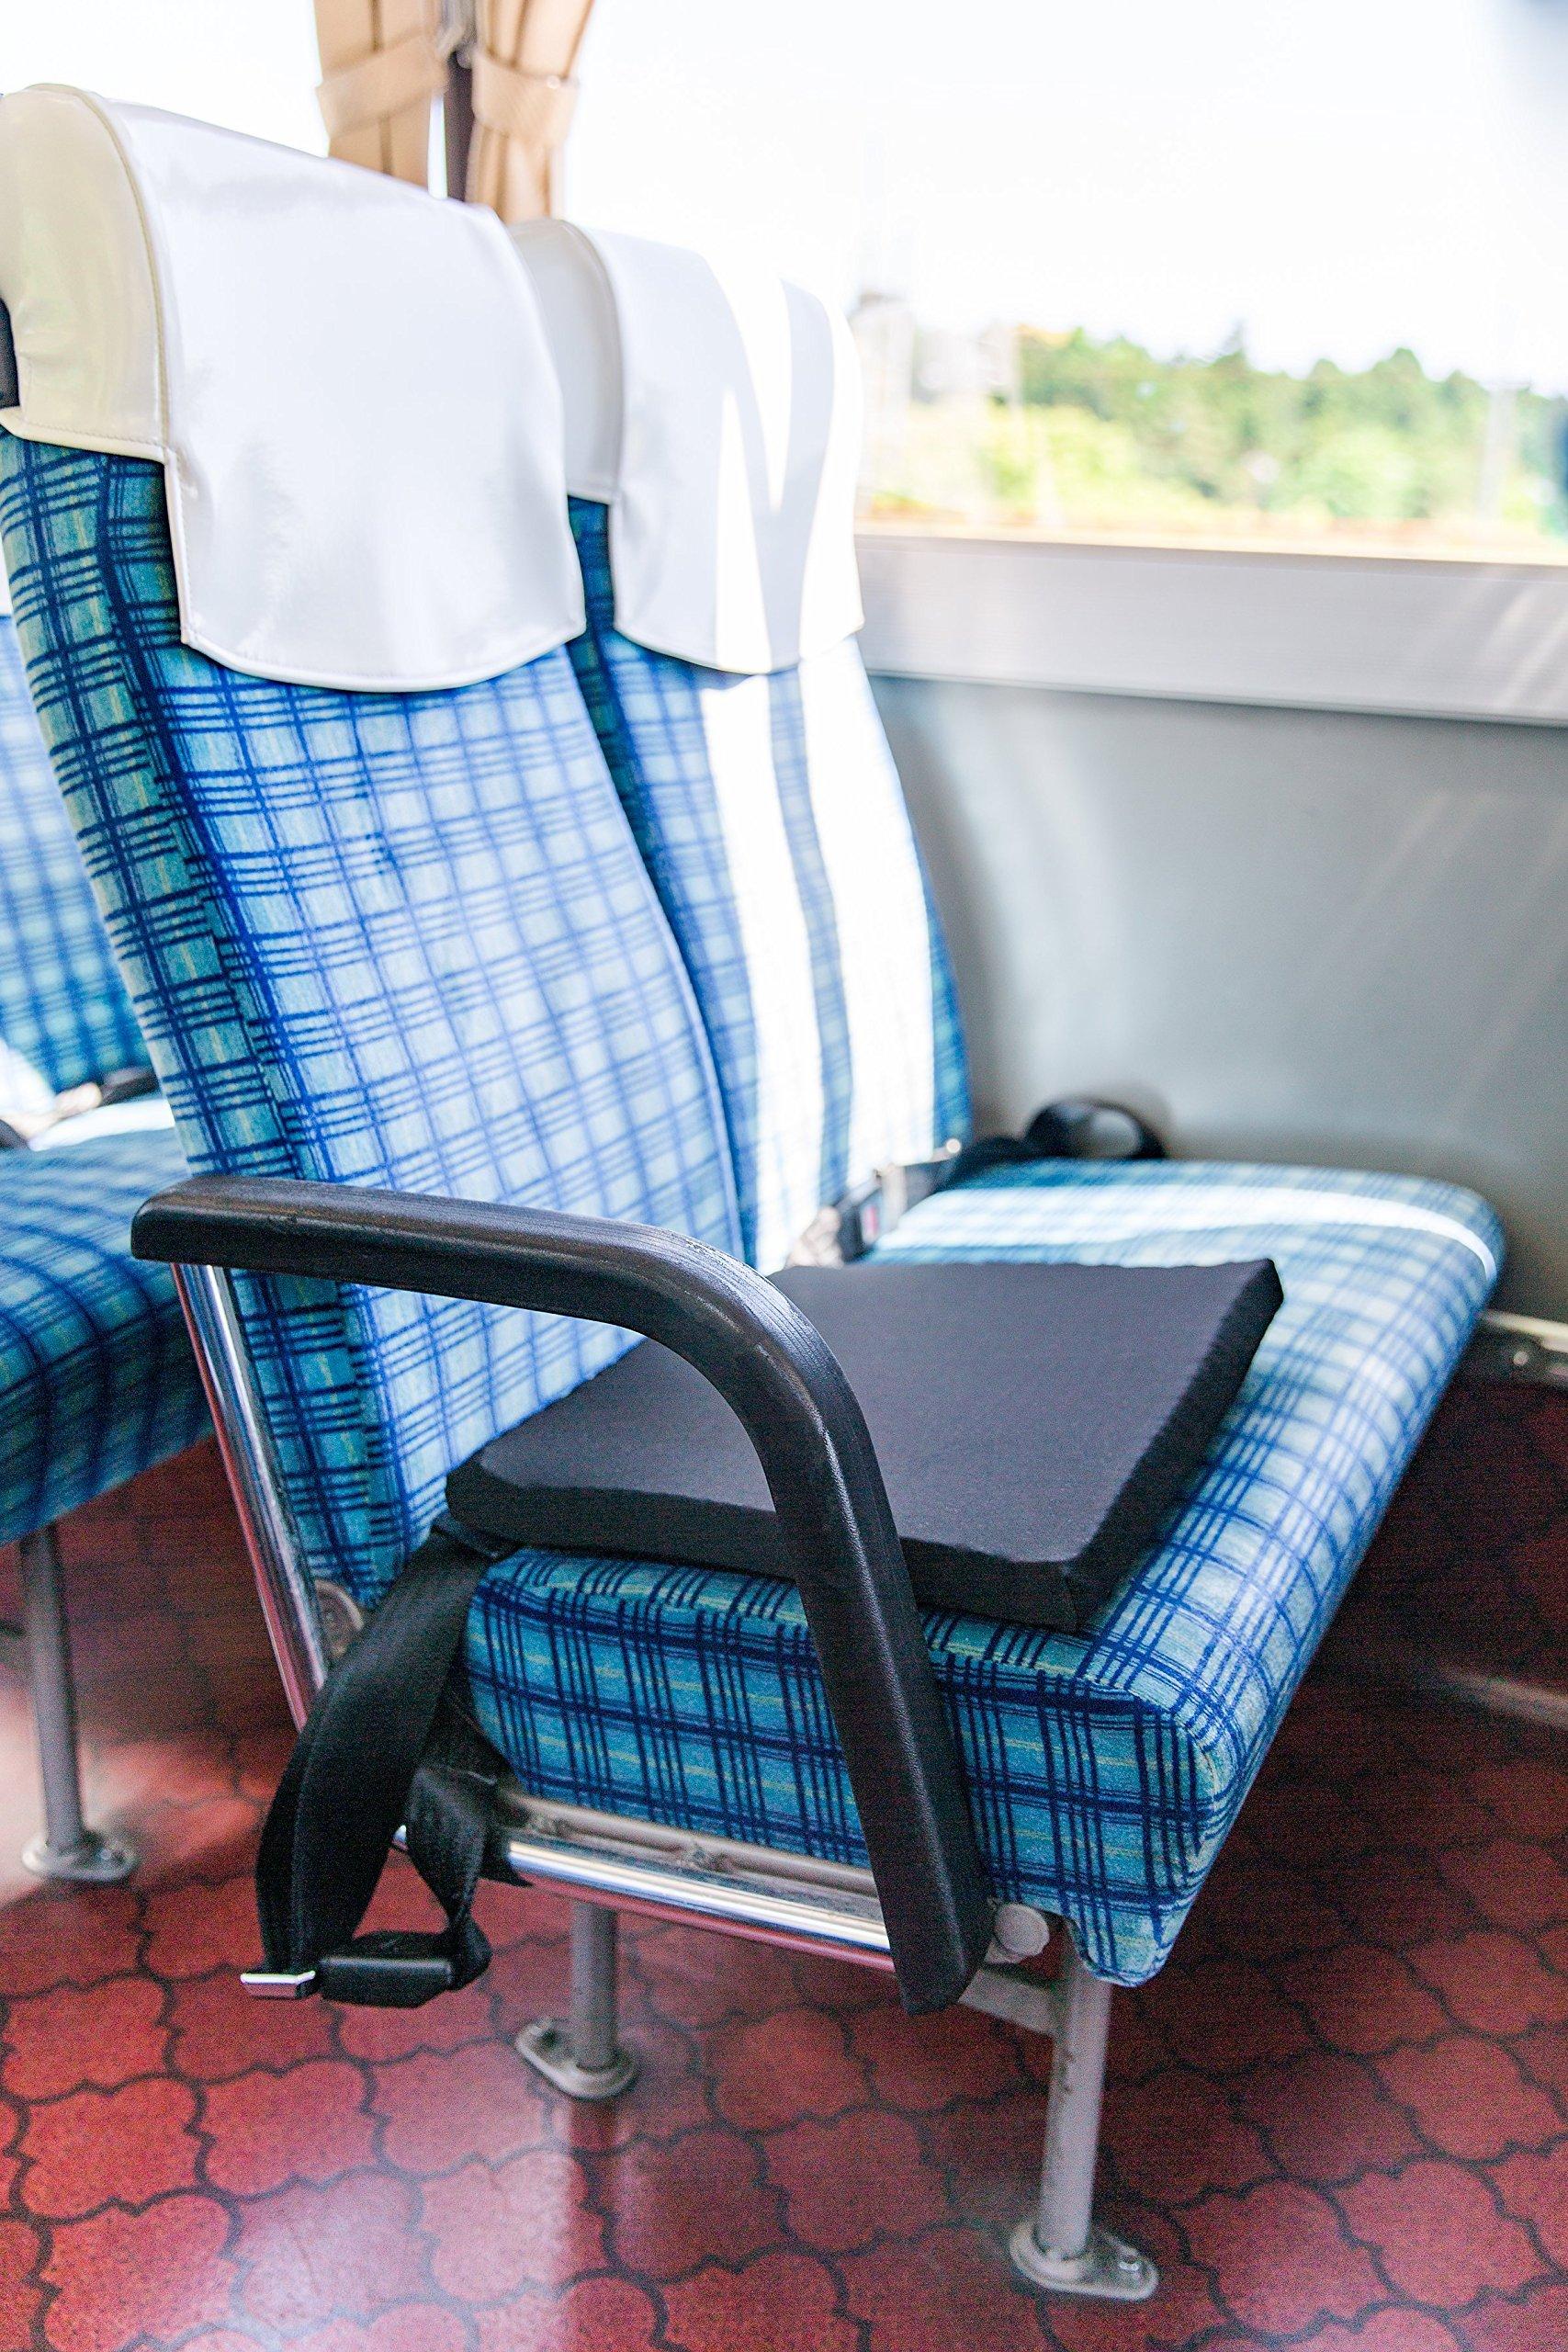 Traveler Gel Seat Cushion - Car, airplane, train, bus and Travel Cushion by Miracle Cushion (Image #8)